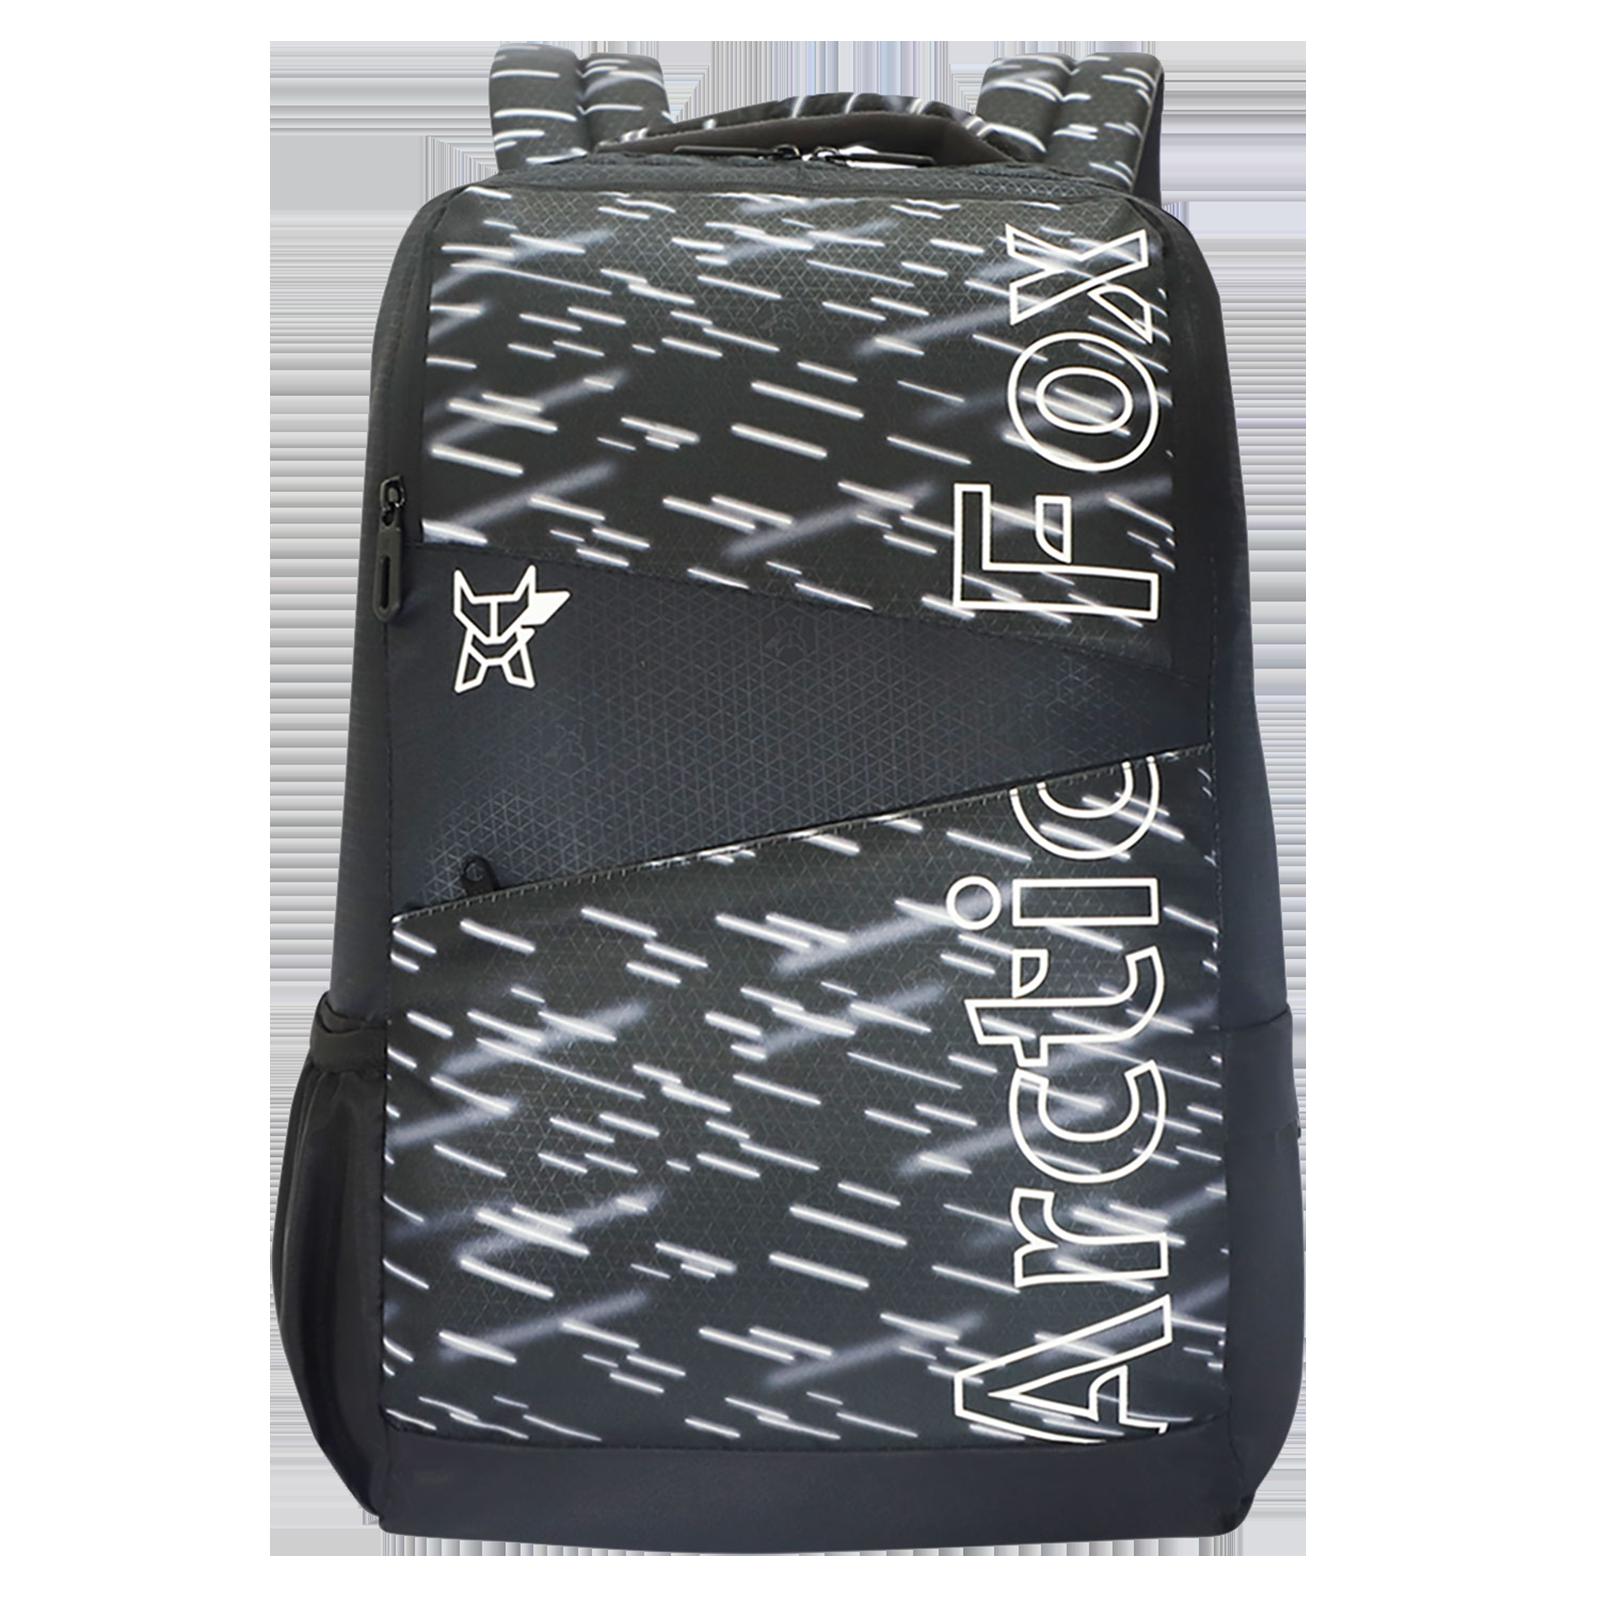 Arctic Fox Metrolite 32.5 Litres PU Coated Polyester Backpack (2 Spacious Compartments, FTEBPKJTBON079033, Jet Black)_1